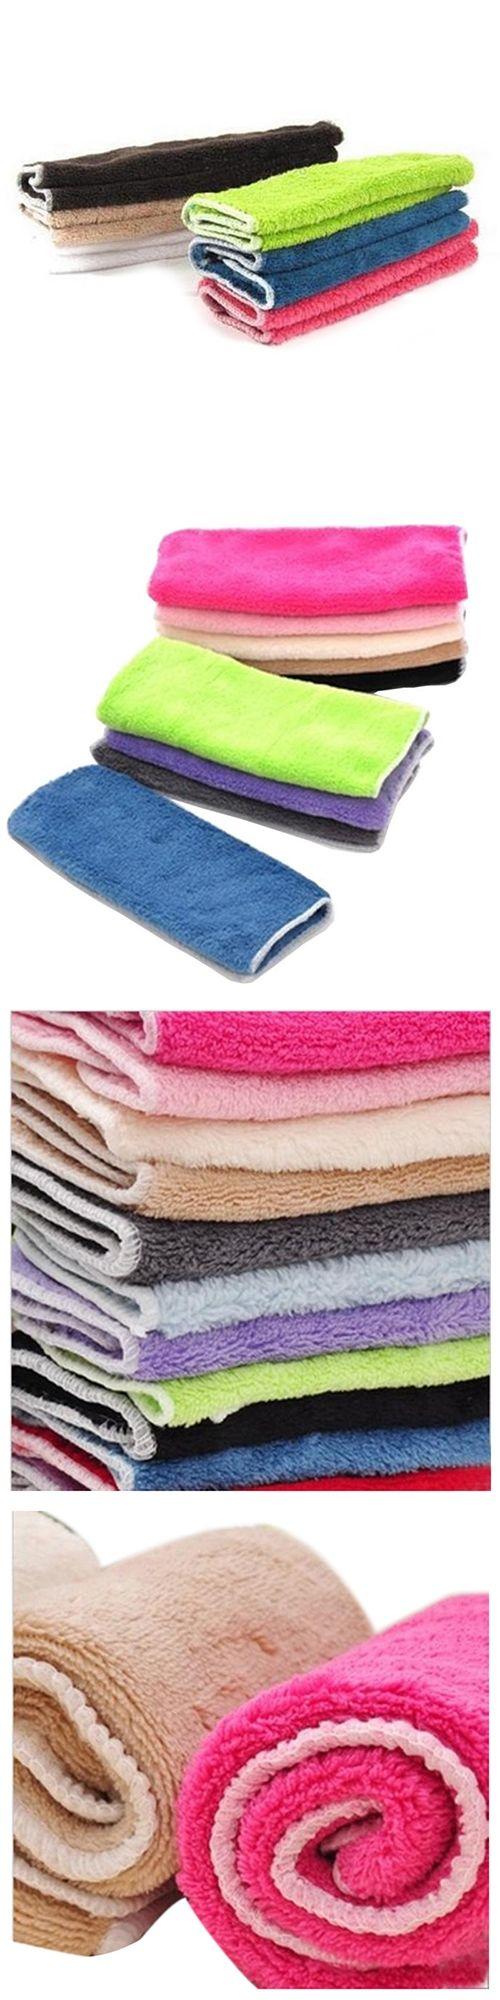 UESH-Anti-grease Cloth Bamboo Fiber Washing Towel Magic Kitchen Cleaning Wiping Rags